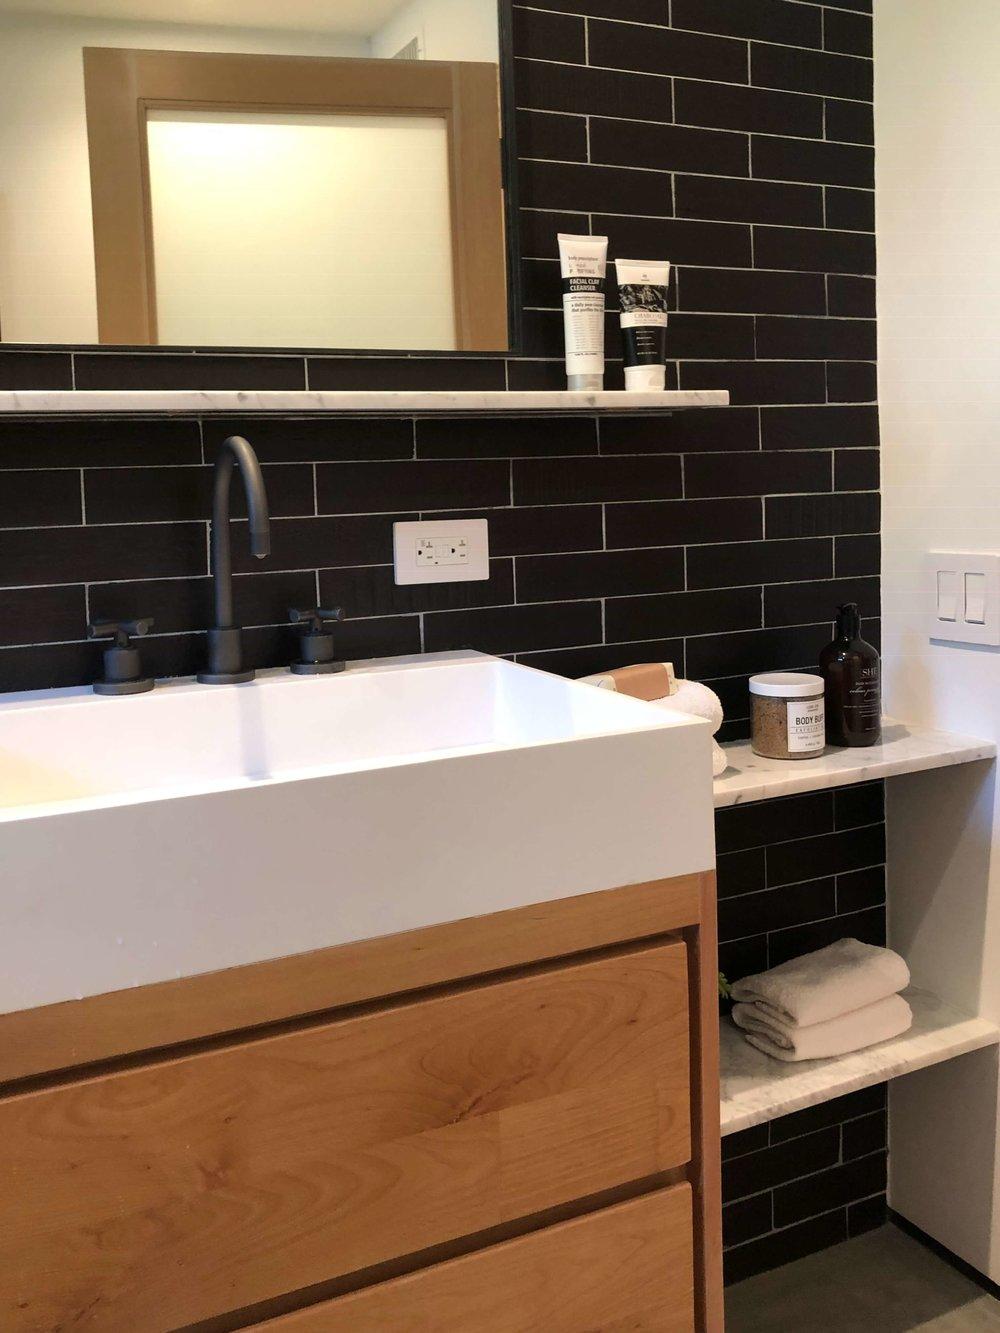 Bathroom vanity in California contemporary home, Dwell on Design's Fall Home Tour, Designer: Vitus Matare #bathroomideas #blacktile